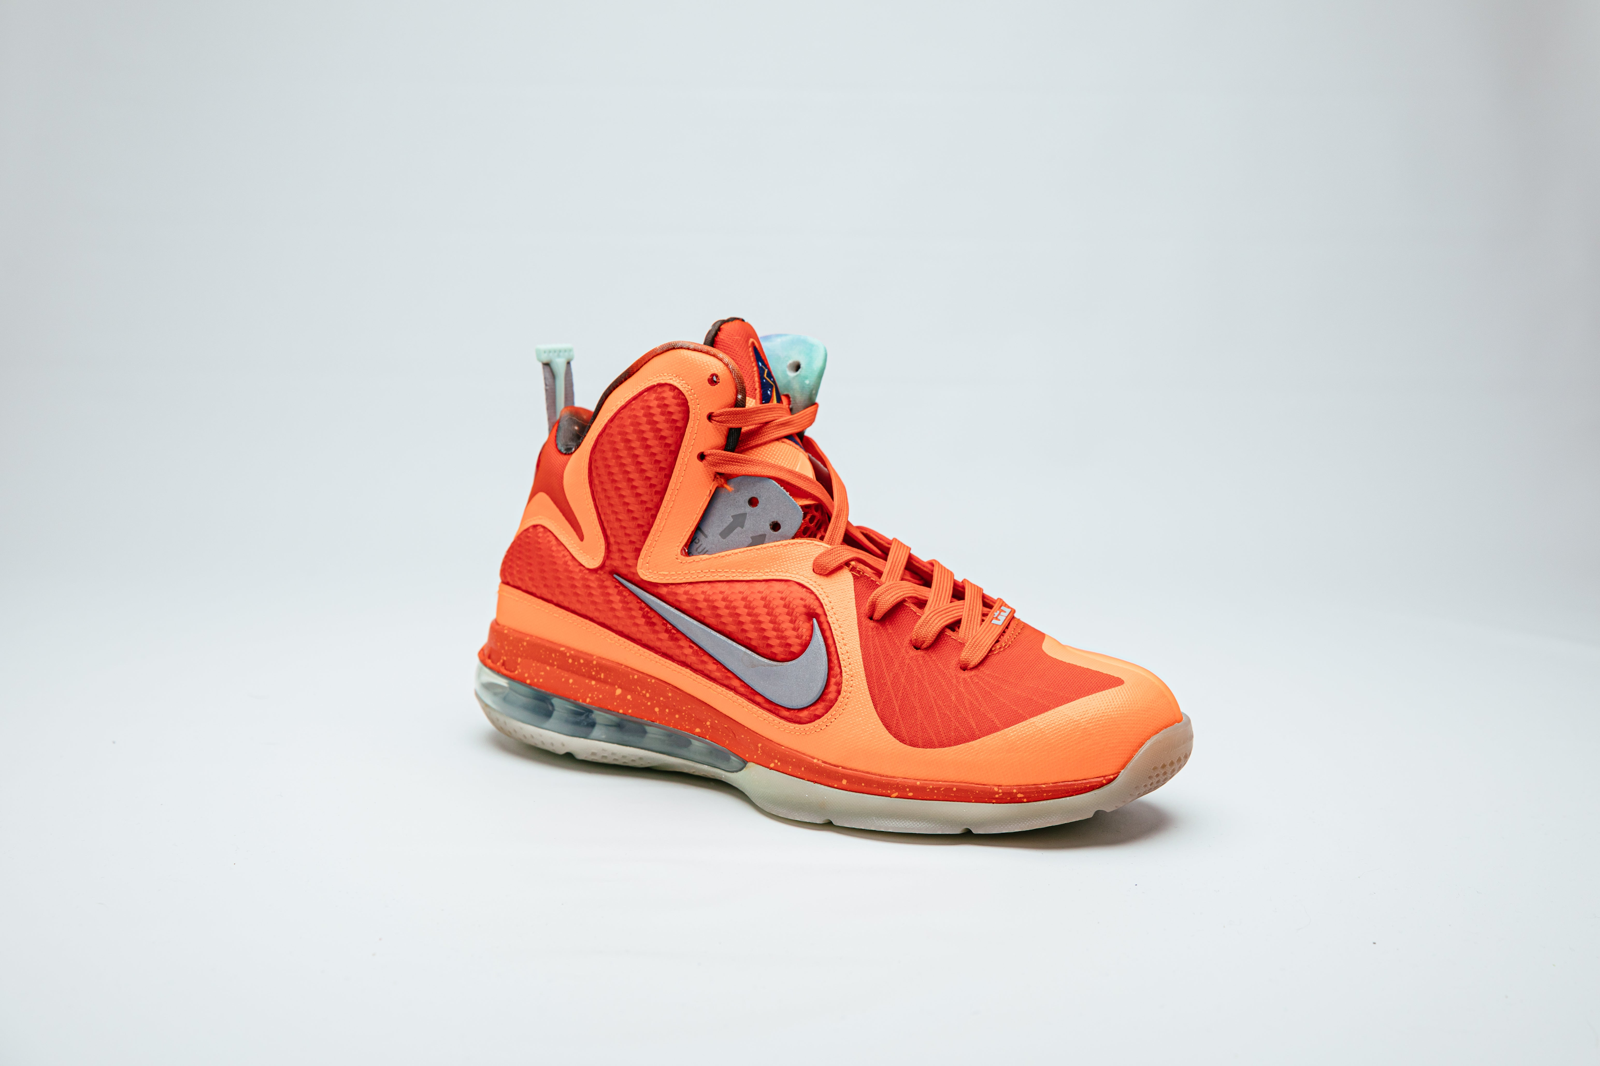 Nike LeBron 9 - Big Bang / All Star